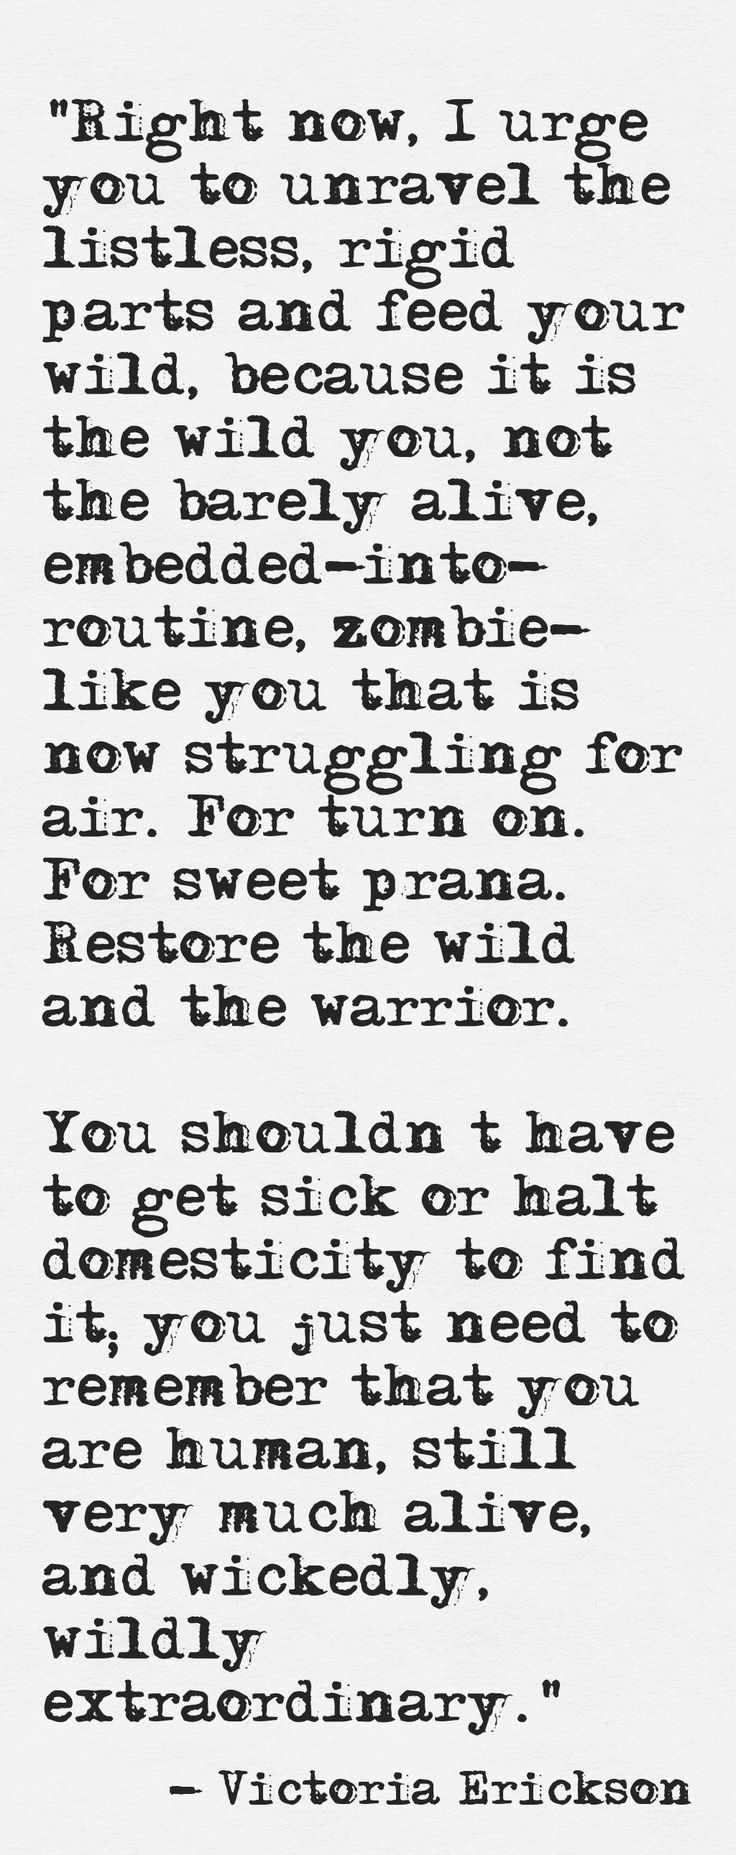 Restore your wild.